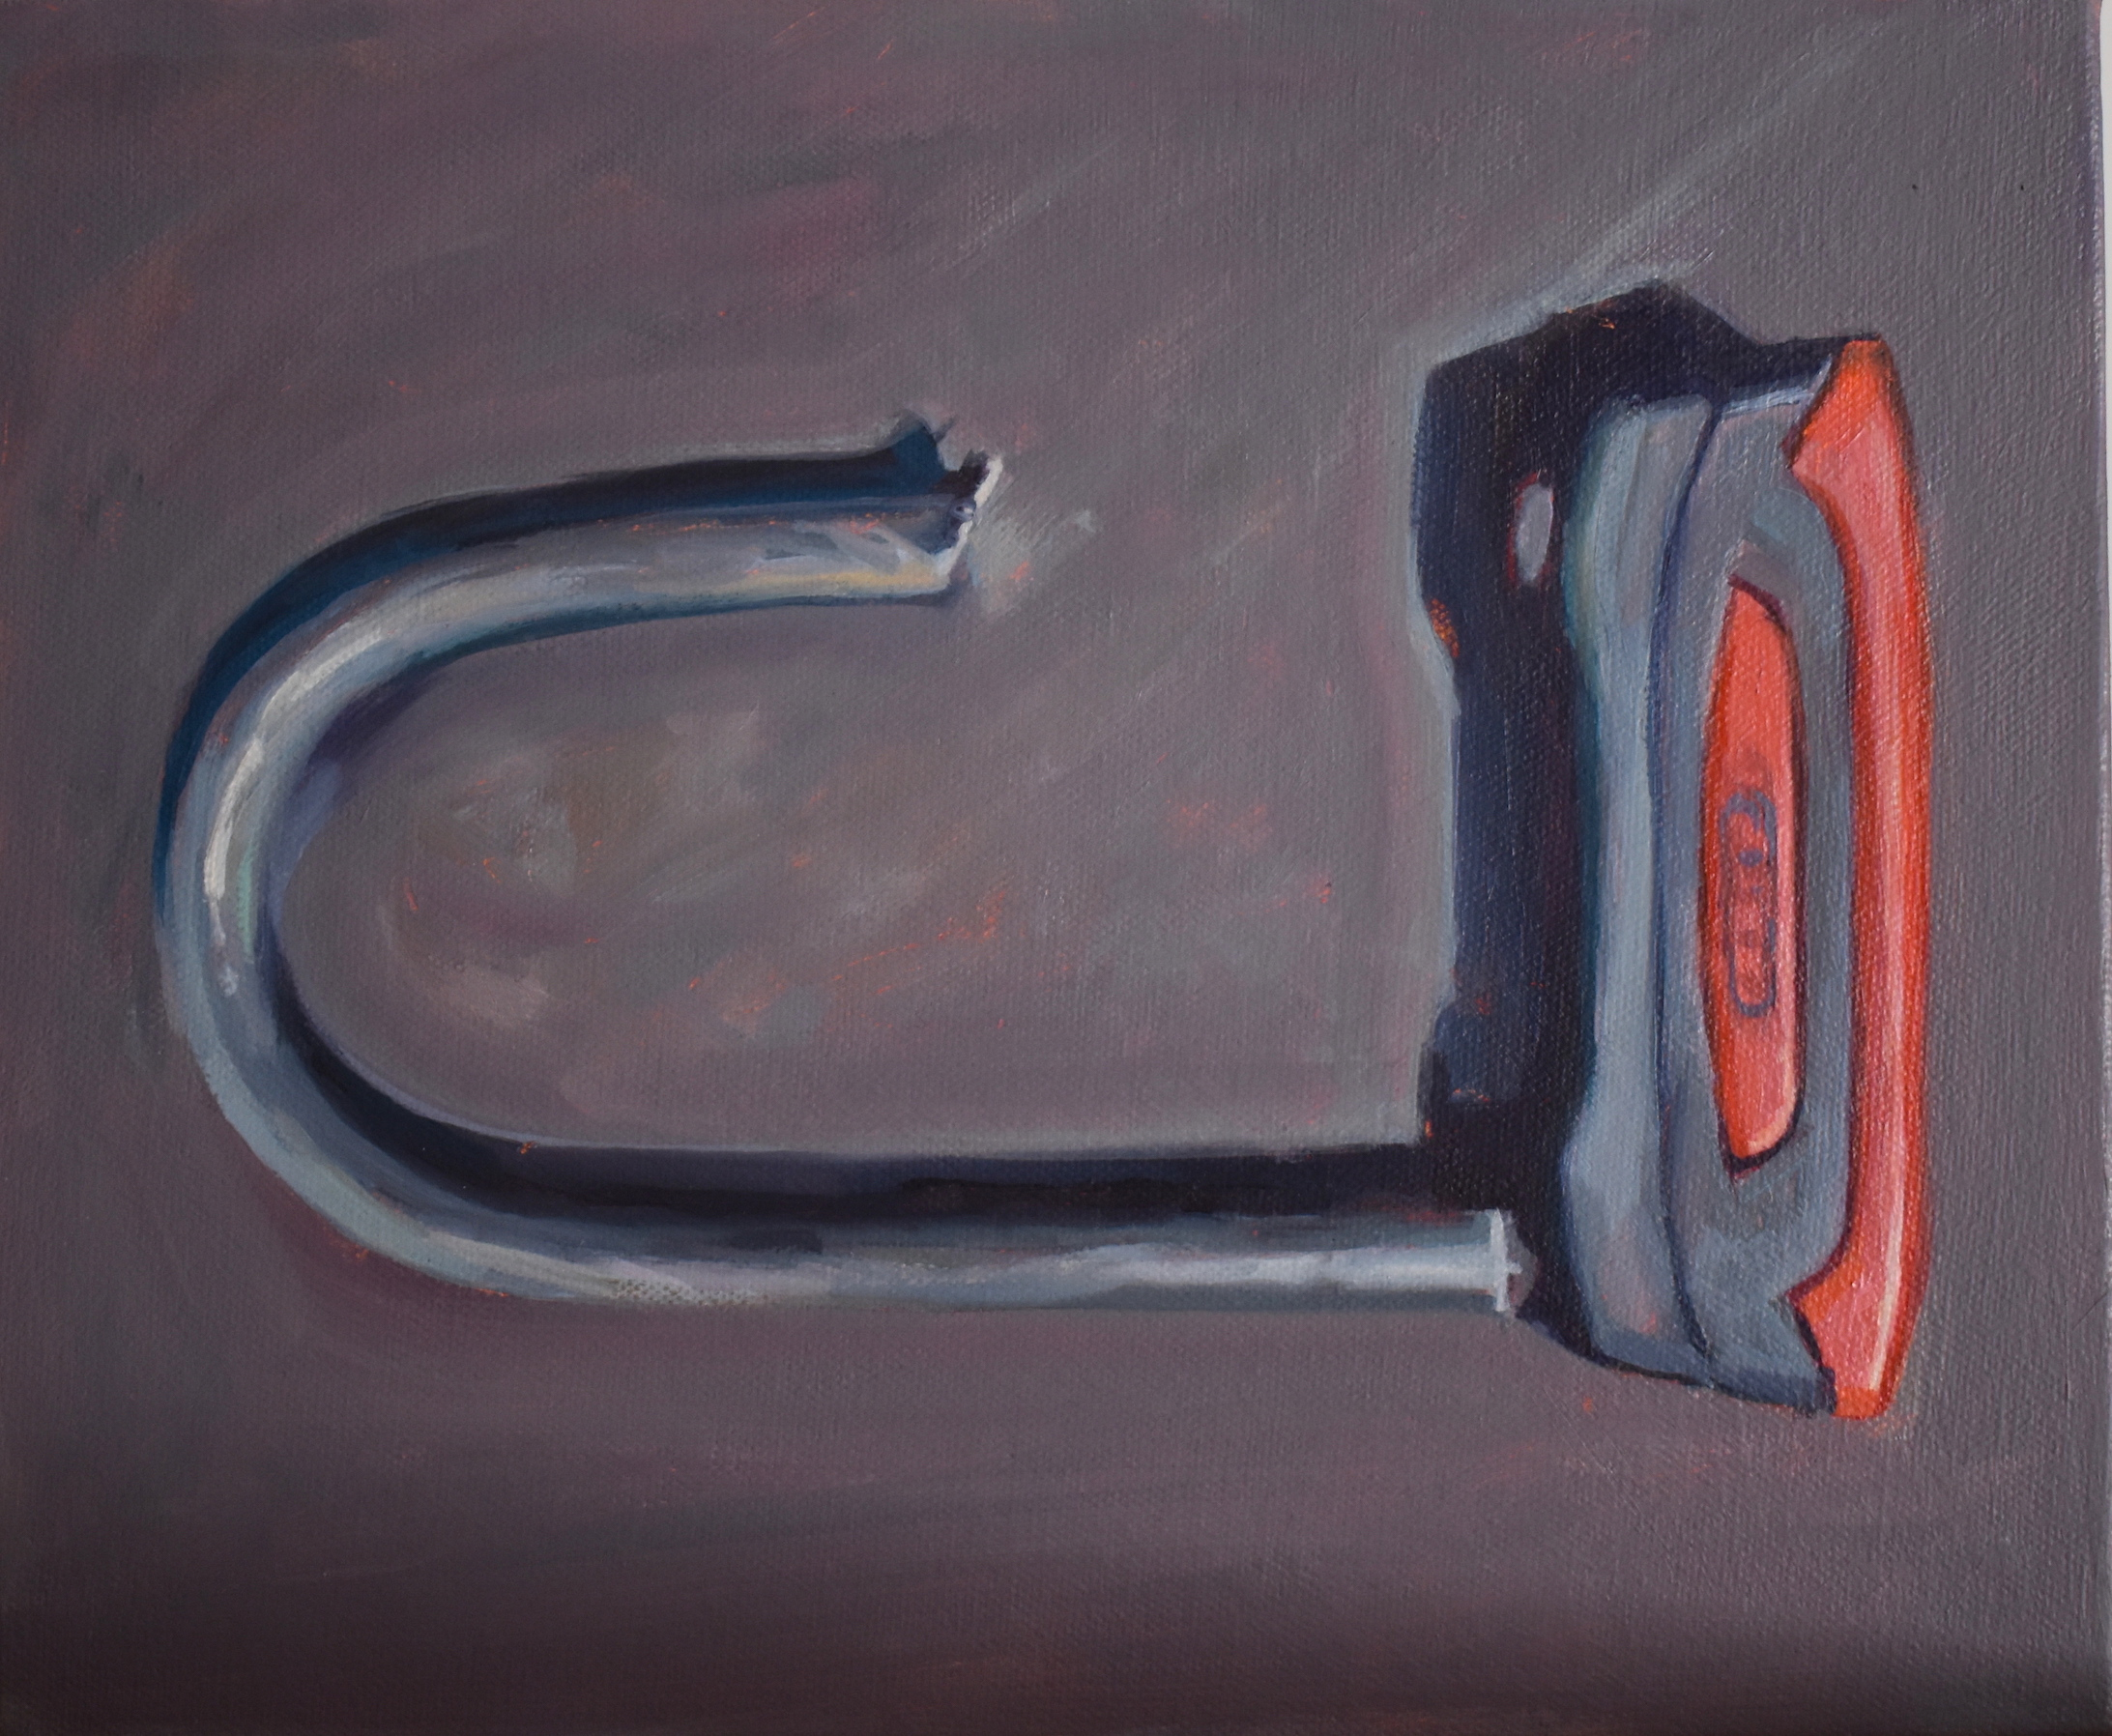 BROKEN PARTS_WRENCH–LEMN SISSAY BIKE LOCK oil on canvas ©HelenStone2020 LO